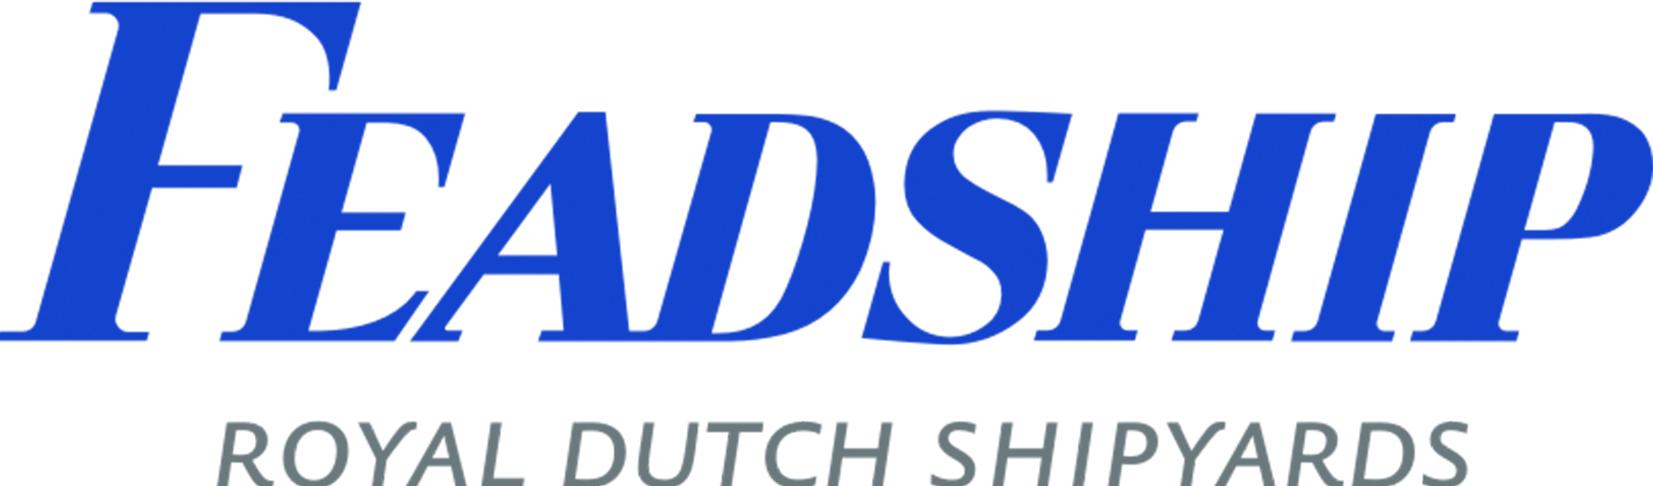 Feadship logo Metalfinish Group